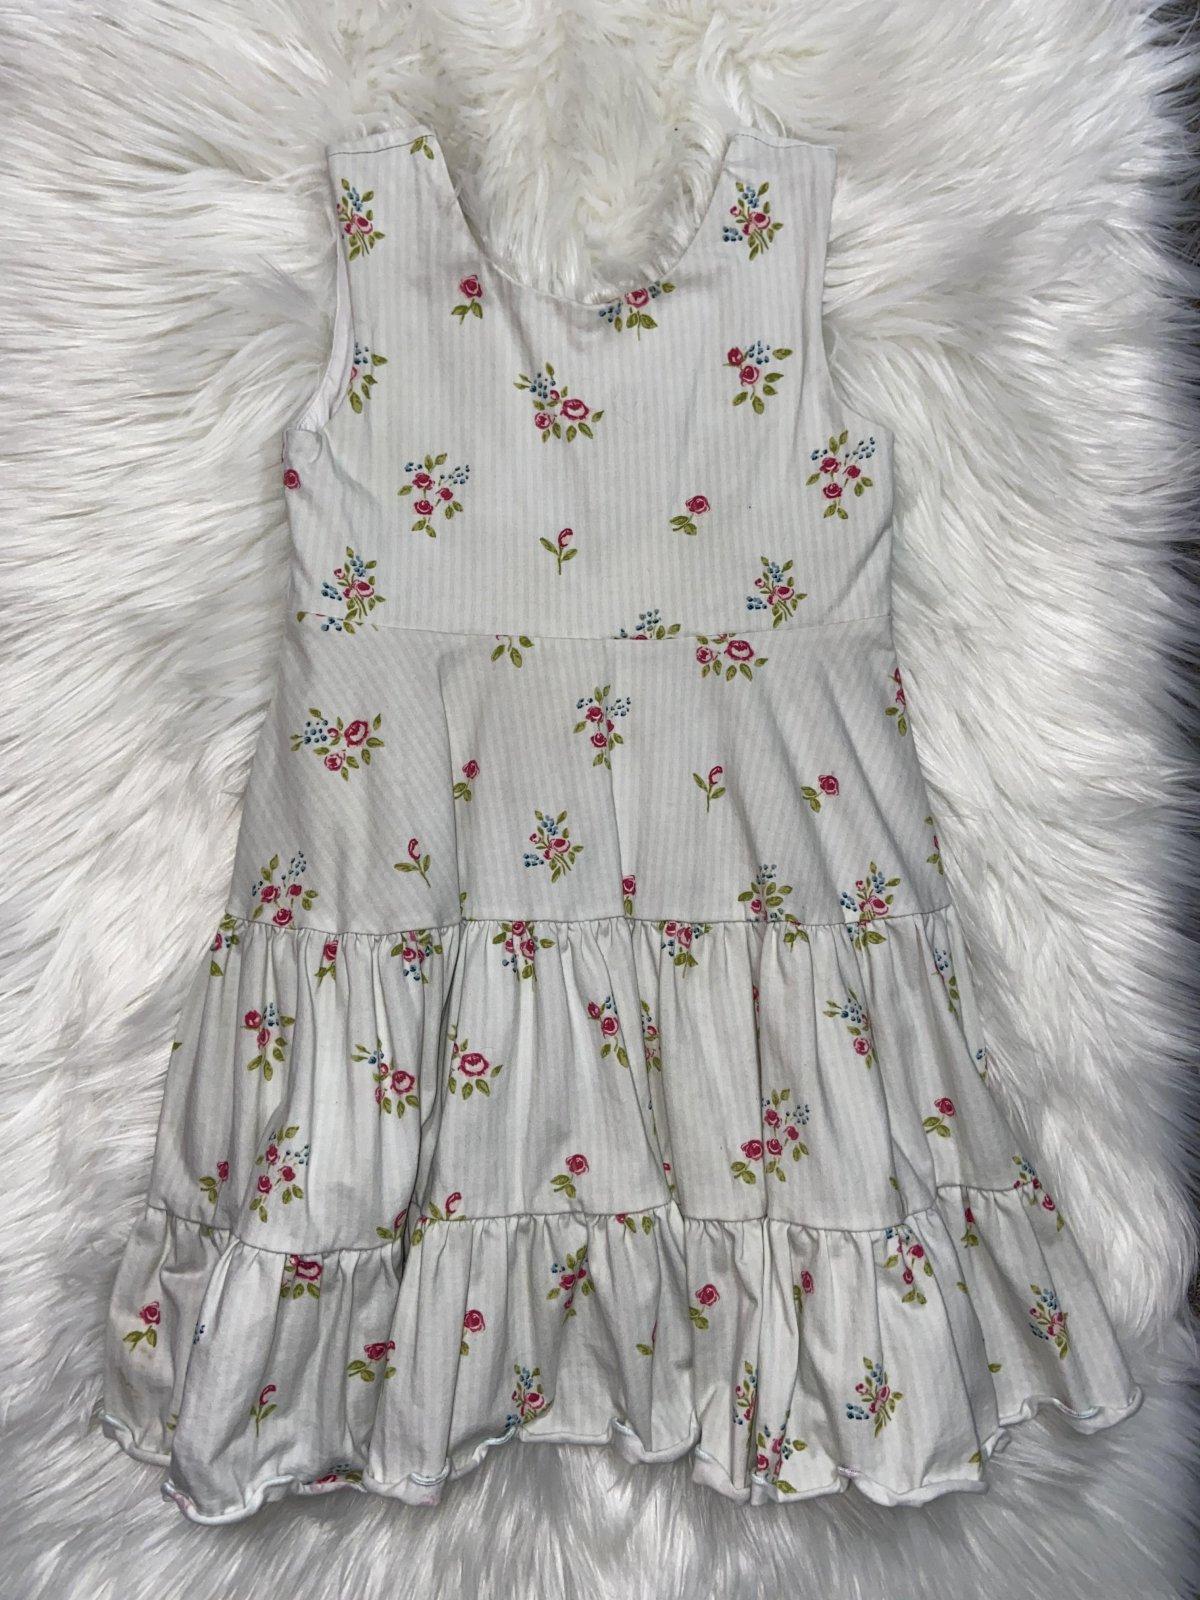 SWEET HONEY DRESS NS SIZE 8